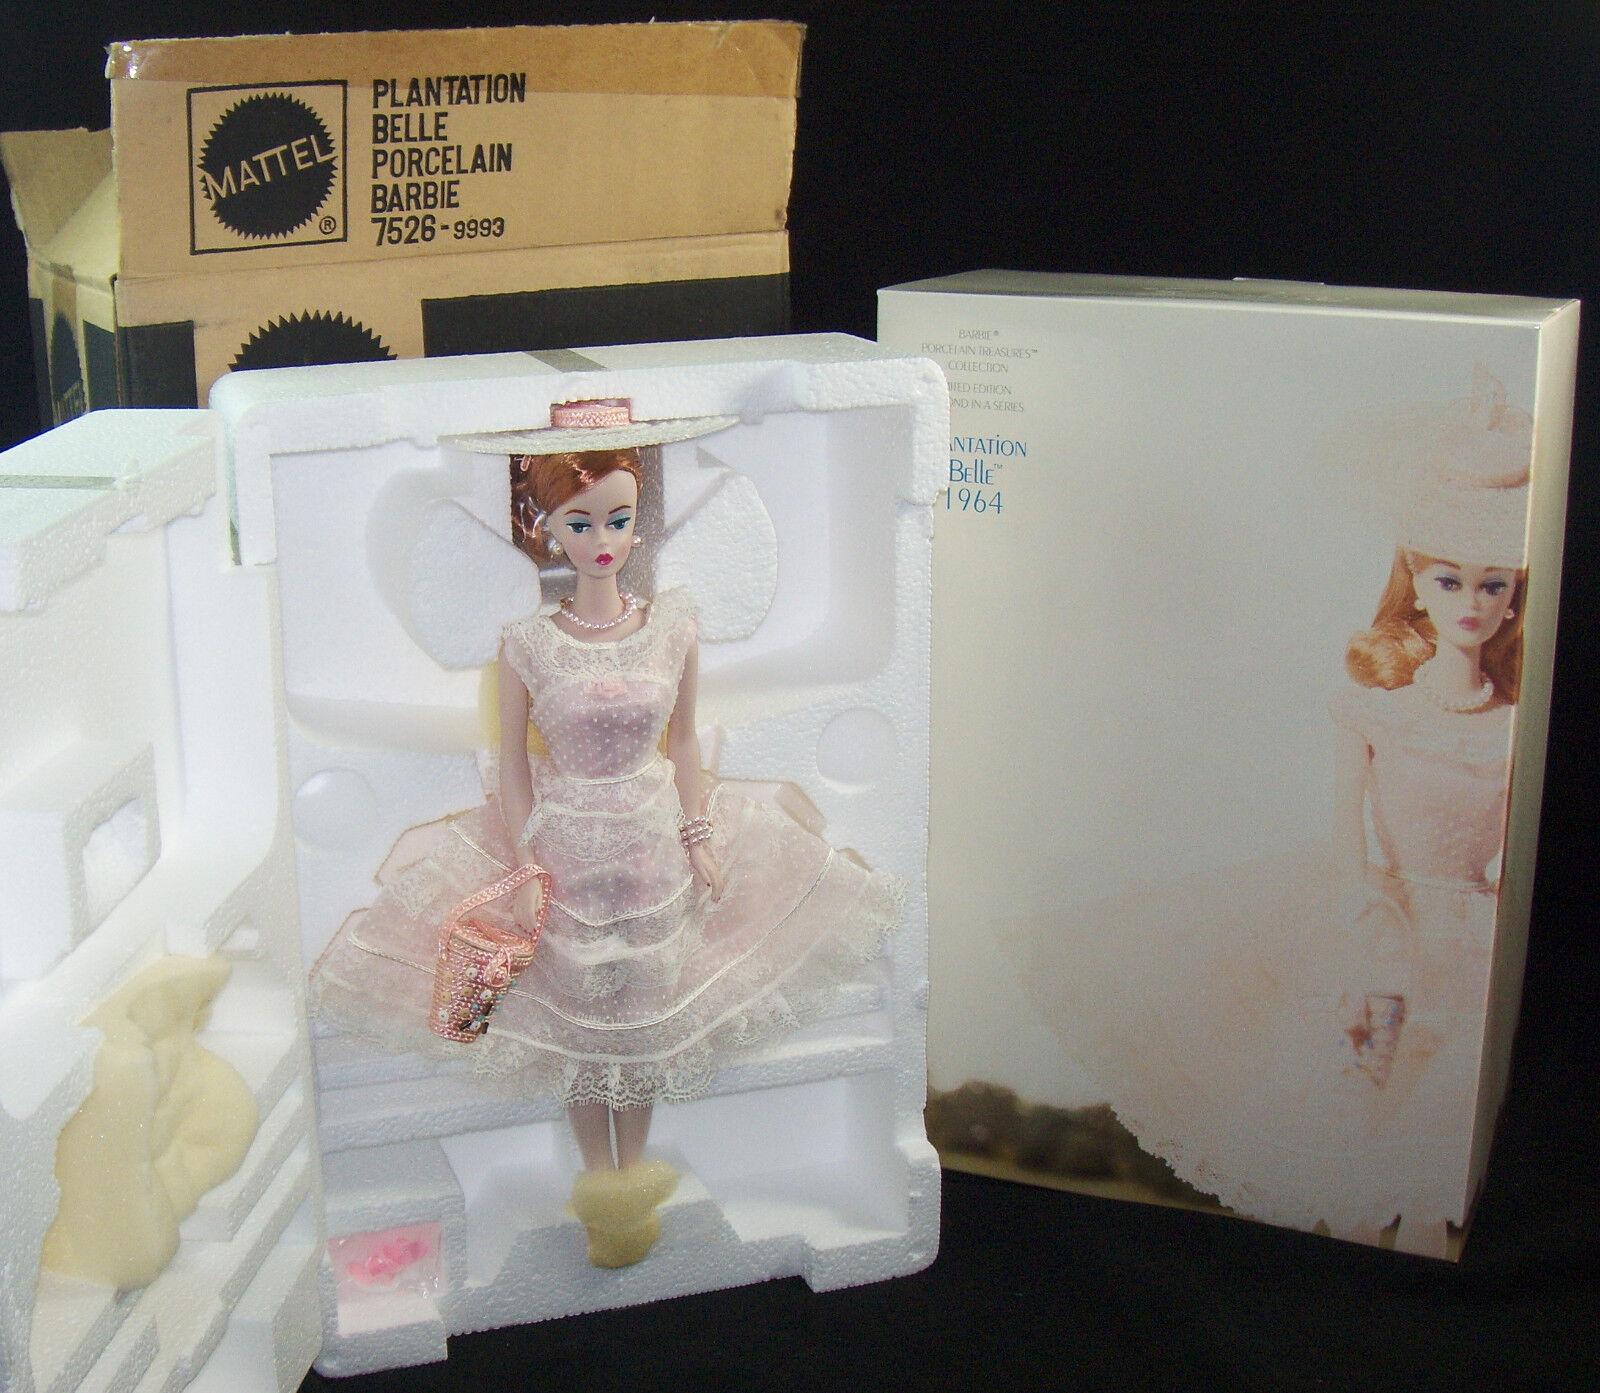 Plantation Belle ROThead Barbie Porzellan Schätze Coll Ltd Ed Absender NRFB '91